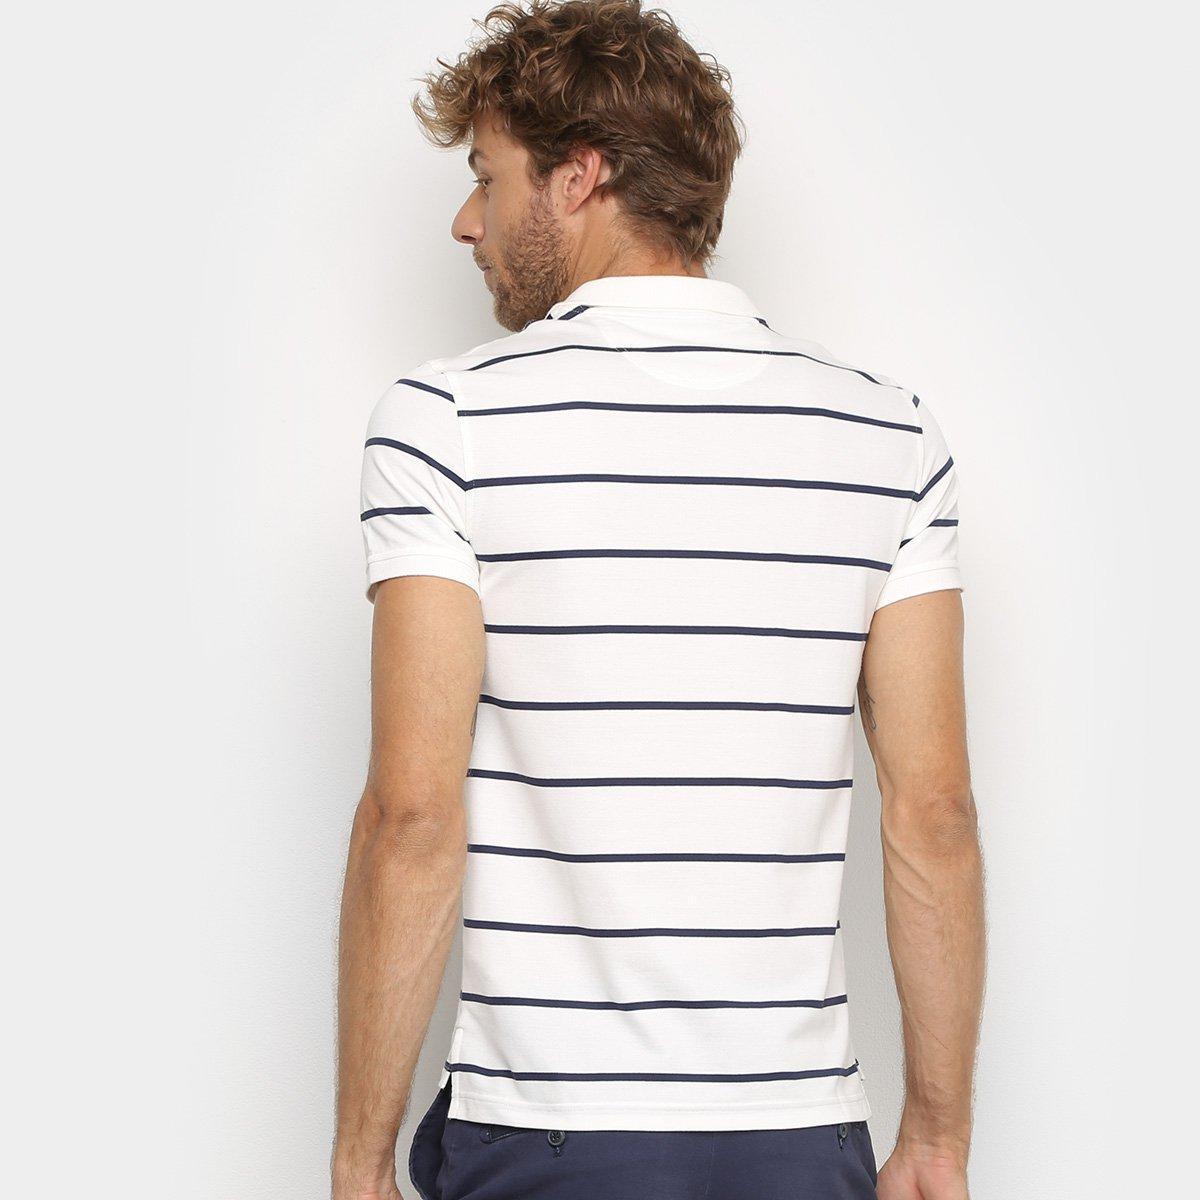 Camisa Polo Izod Listrada Masculina - Branco e Azul